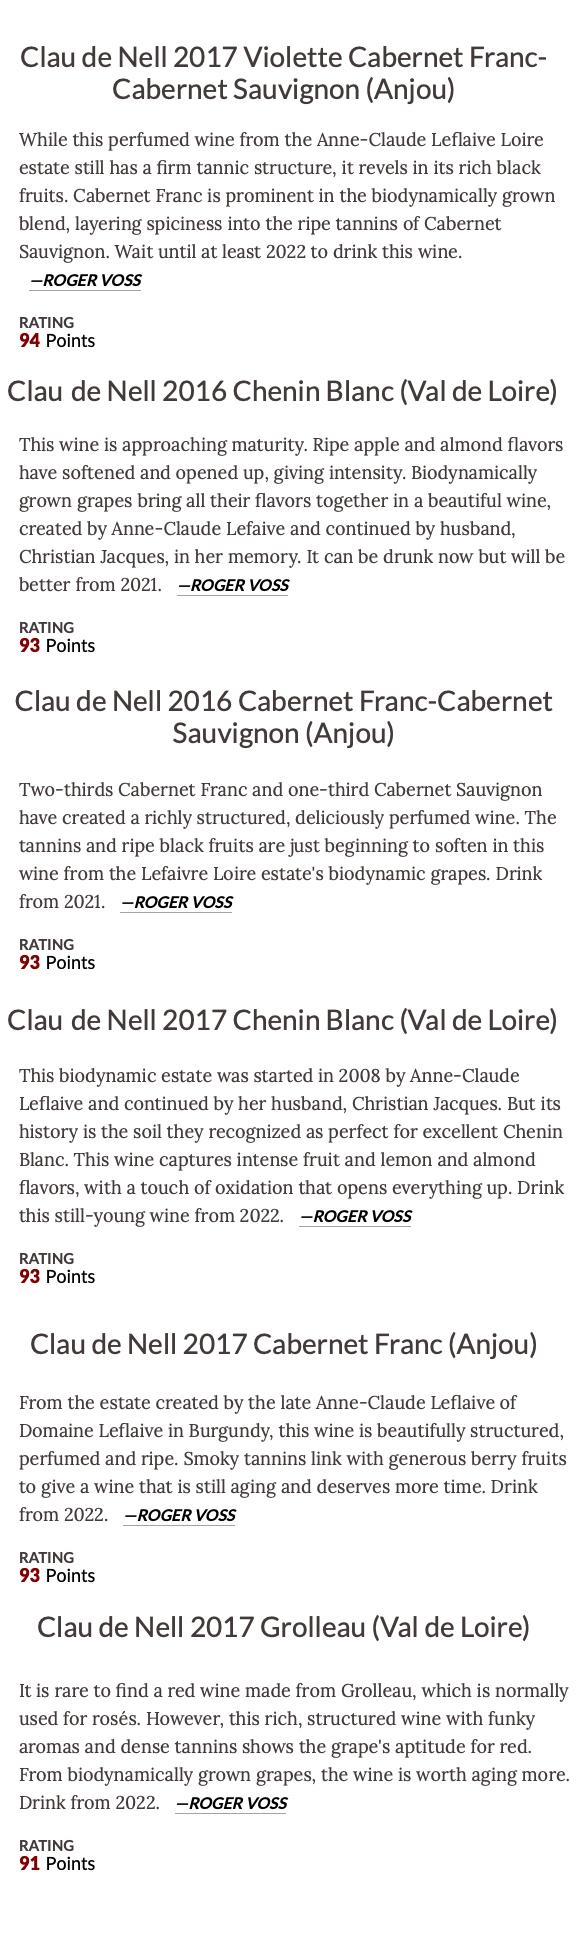 WineEnthusiast - Clau de Nell